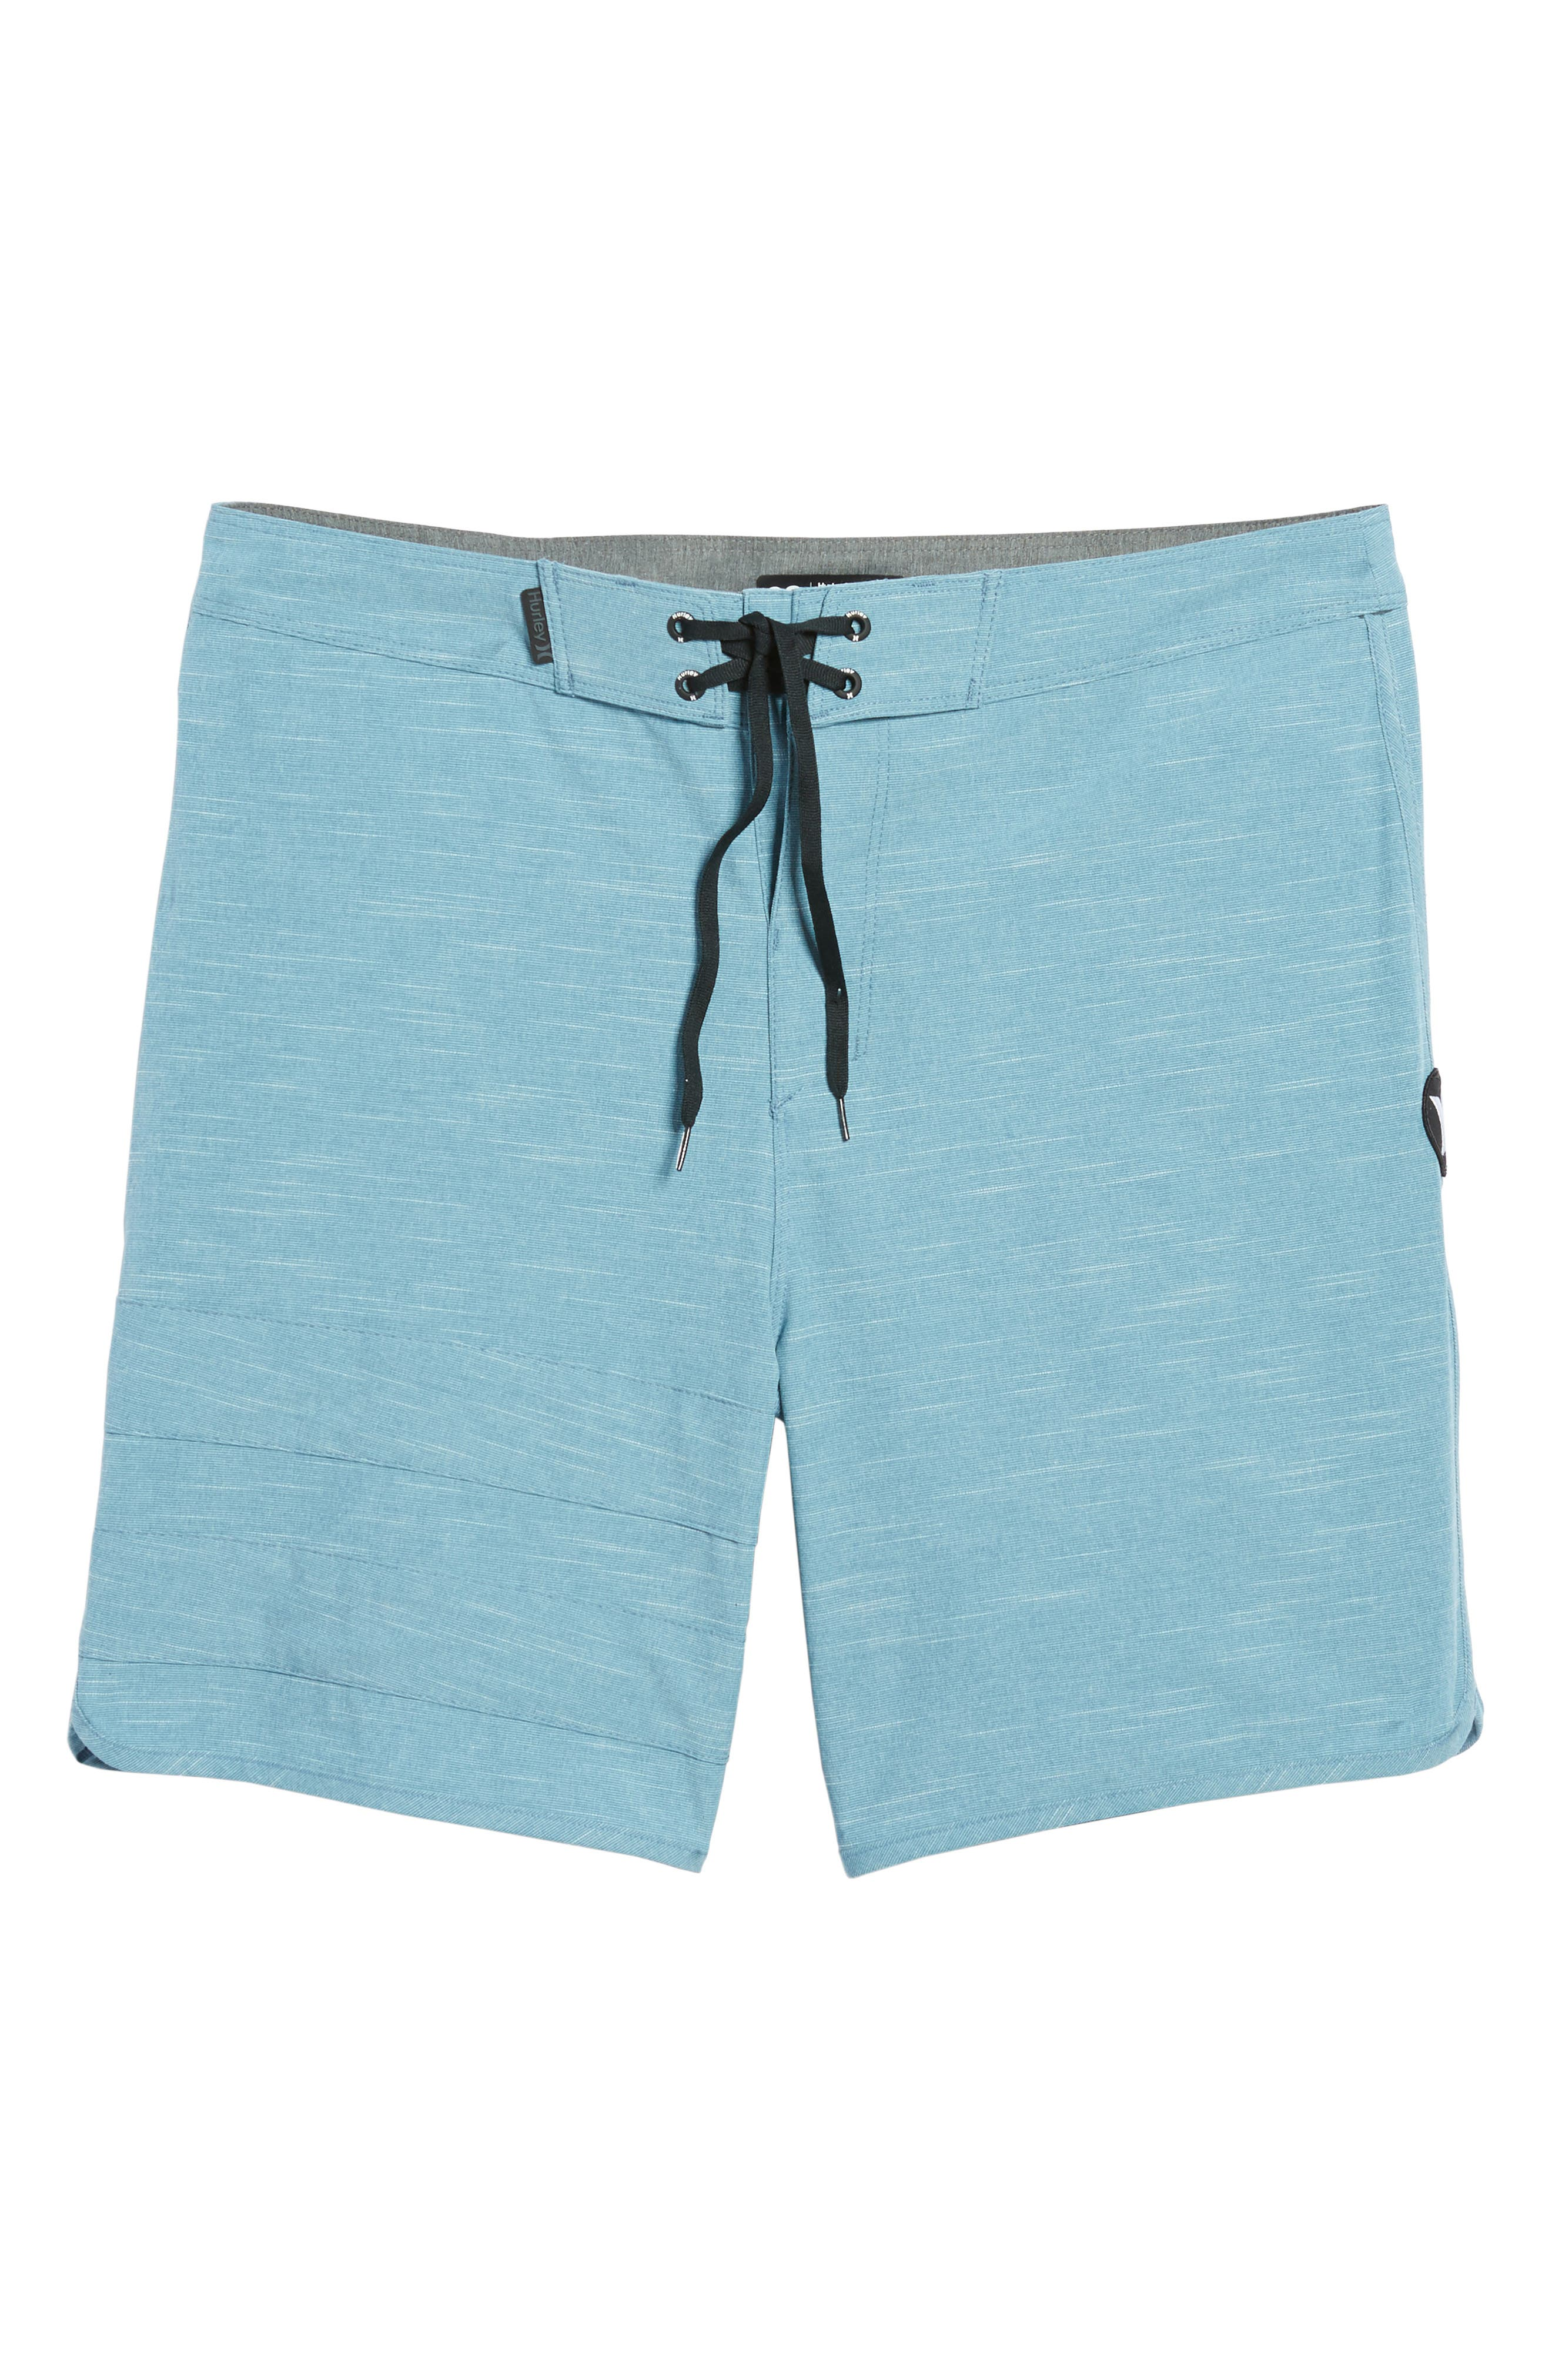 Shoreside Board Shorts,                             Alternate thumbnail 12, color,